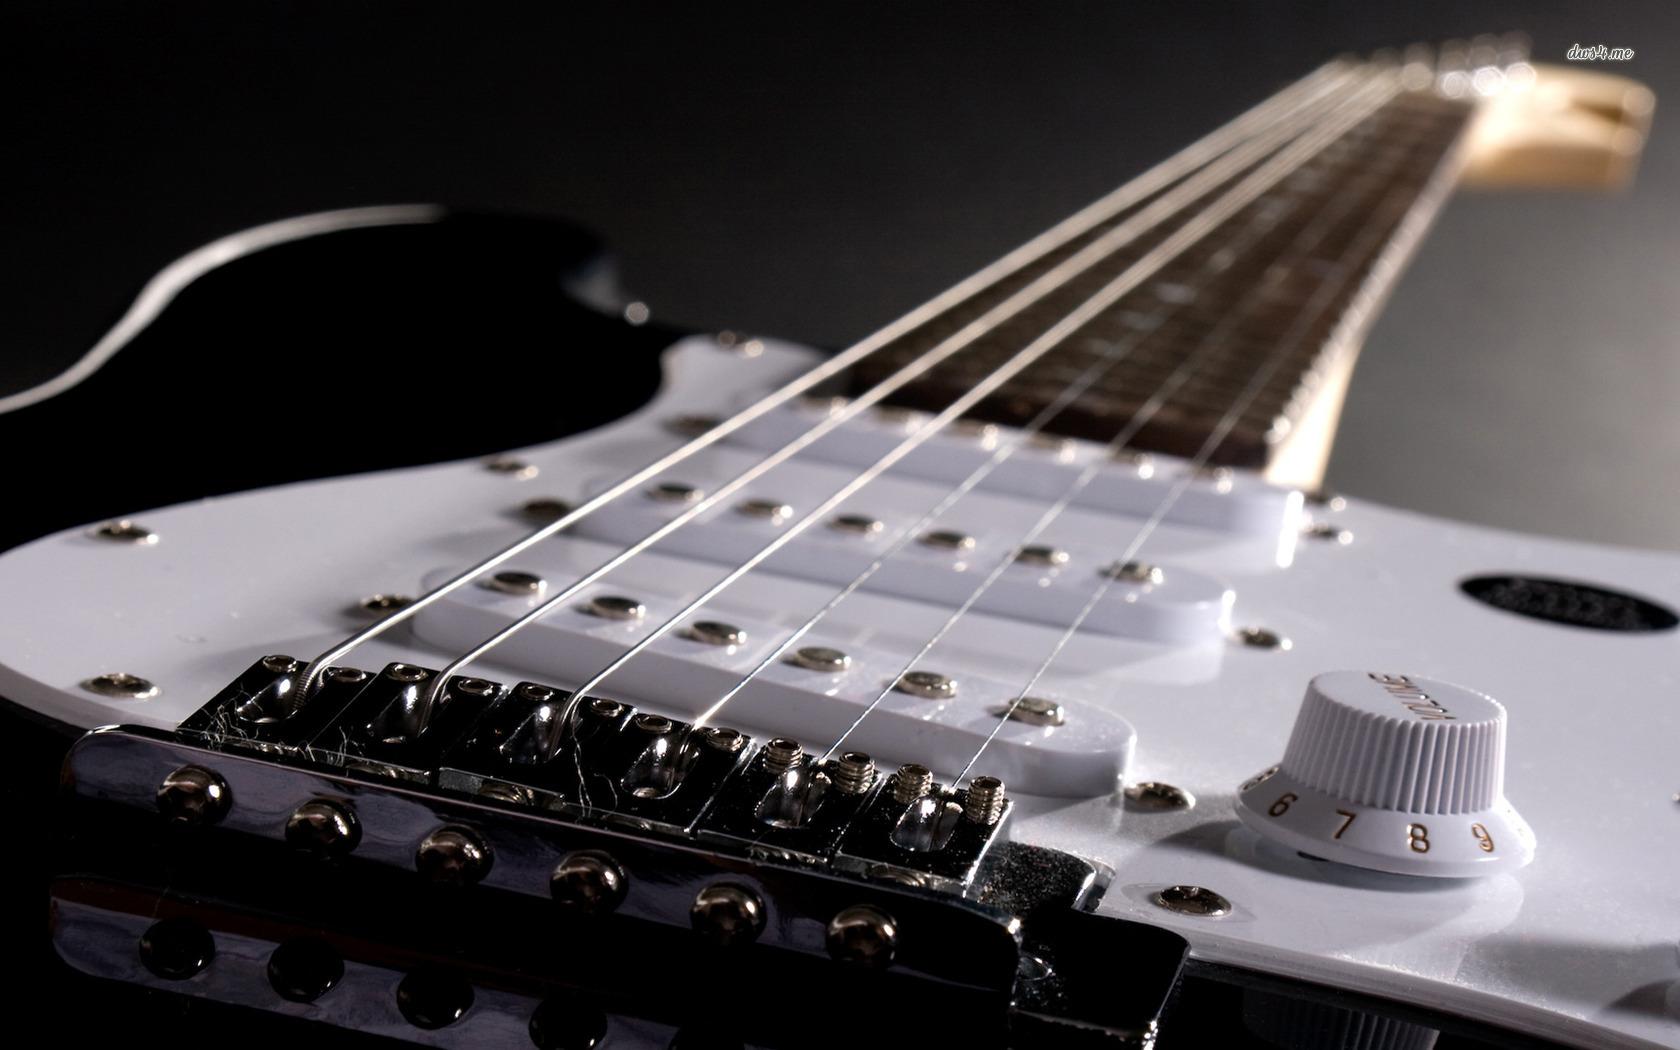 Electric Guitar wallpaper   Music wallpapers   1622 1680x1050